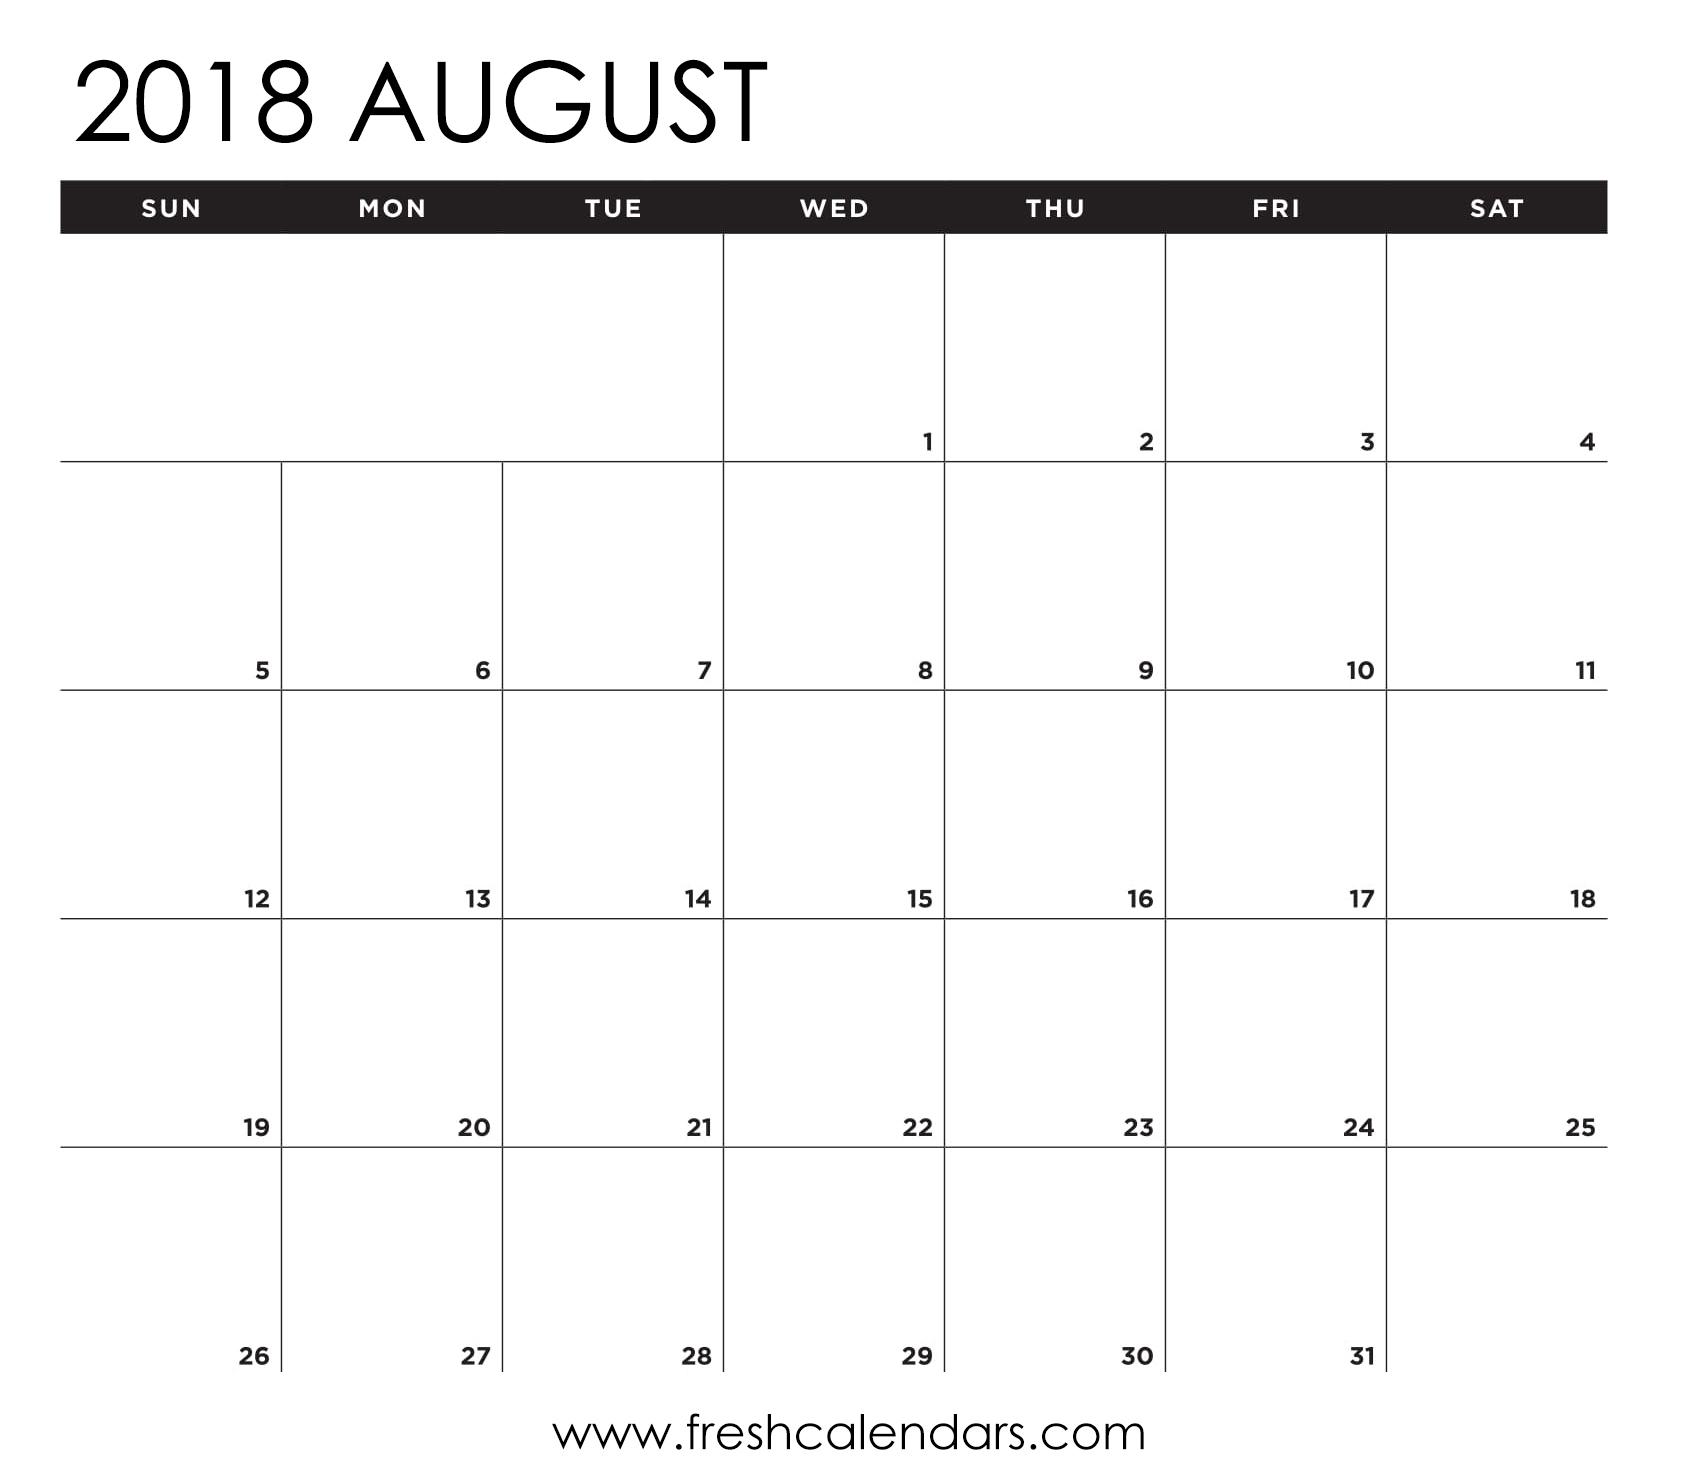 August 2018 Calendar Printable - Fresh Calendars regarding Printable Monthly Calendar Templates August